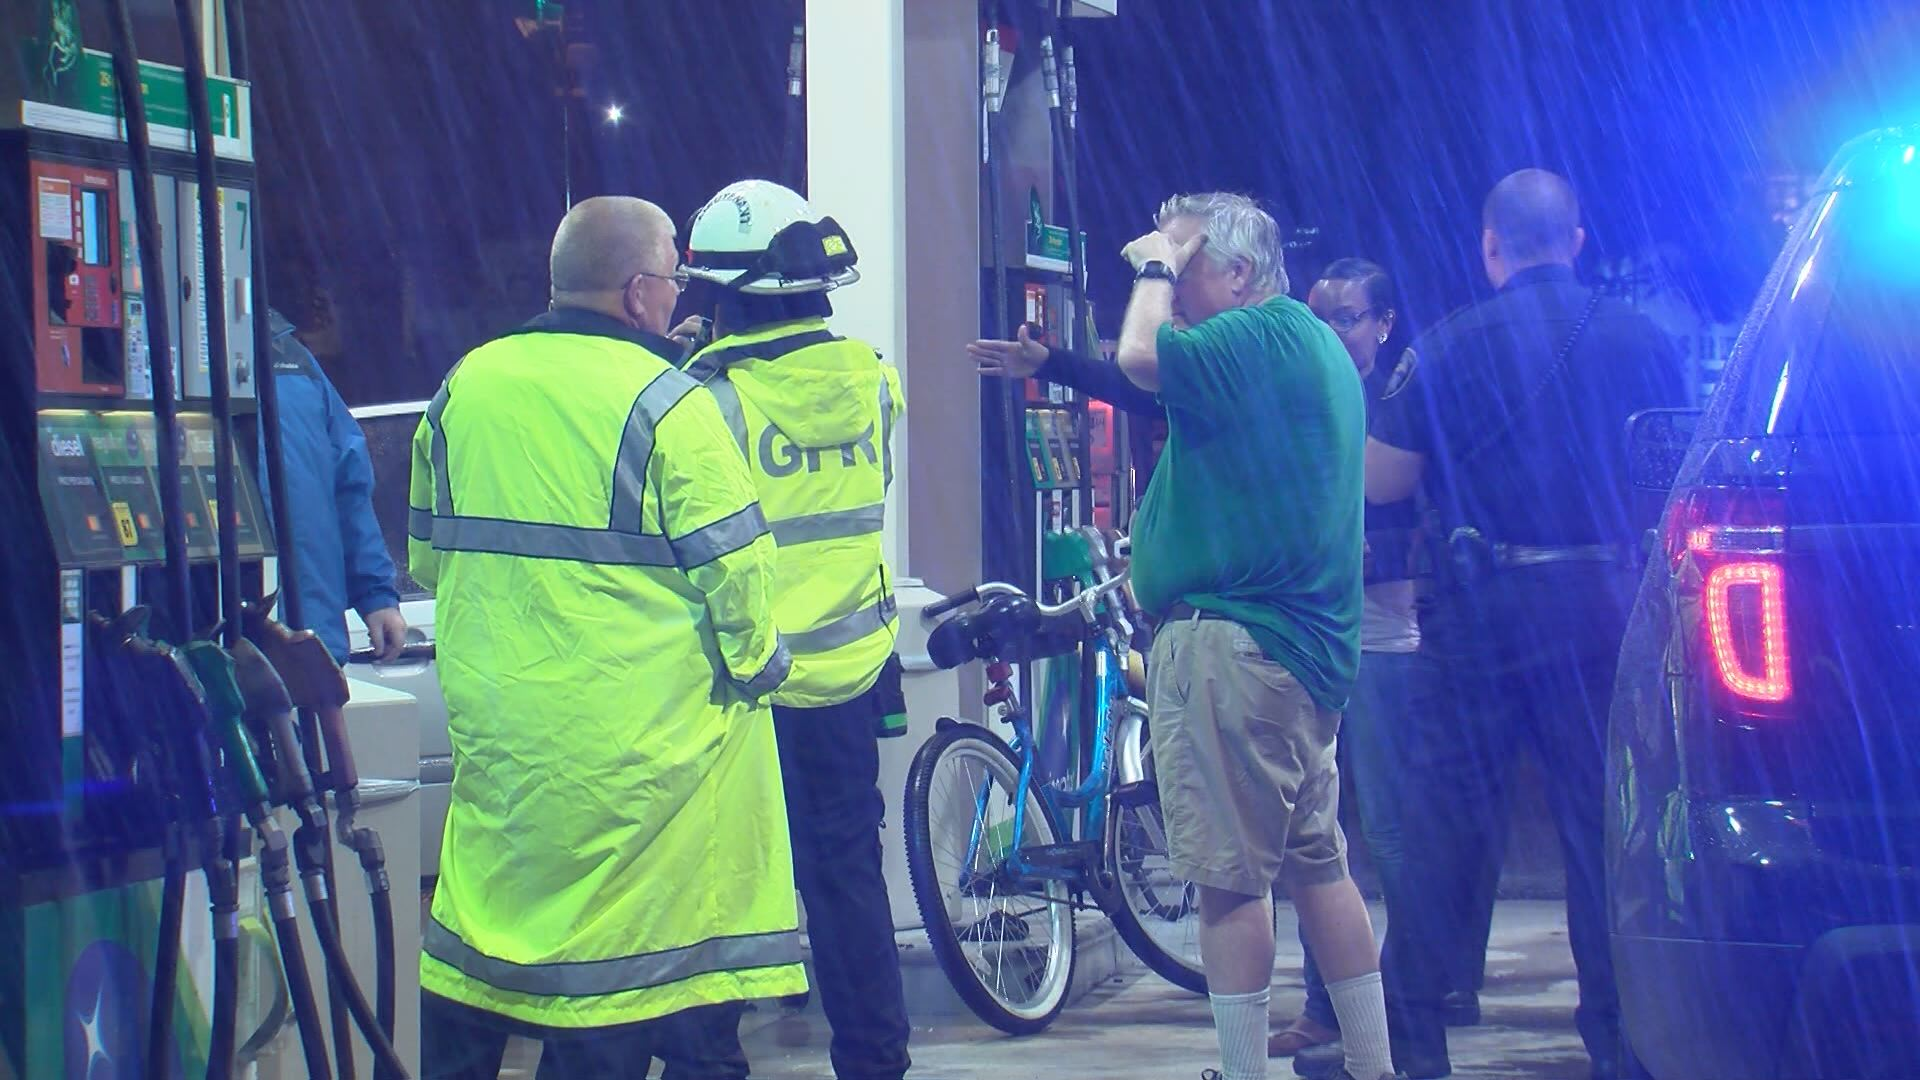 Man on bike hit by car_25064